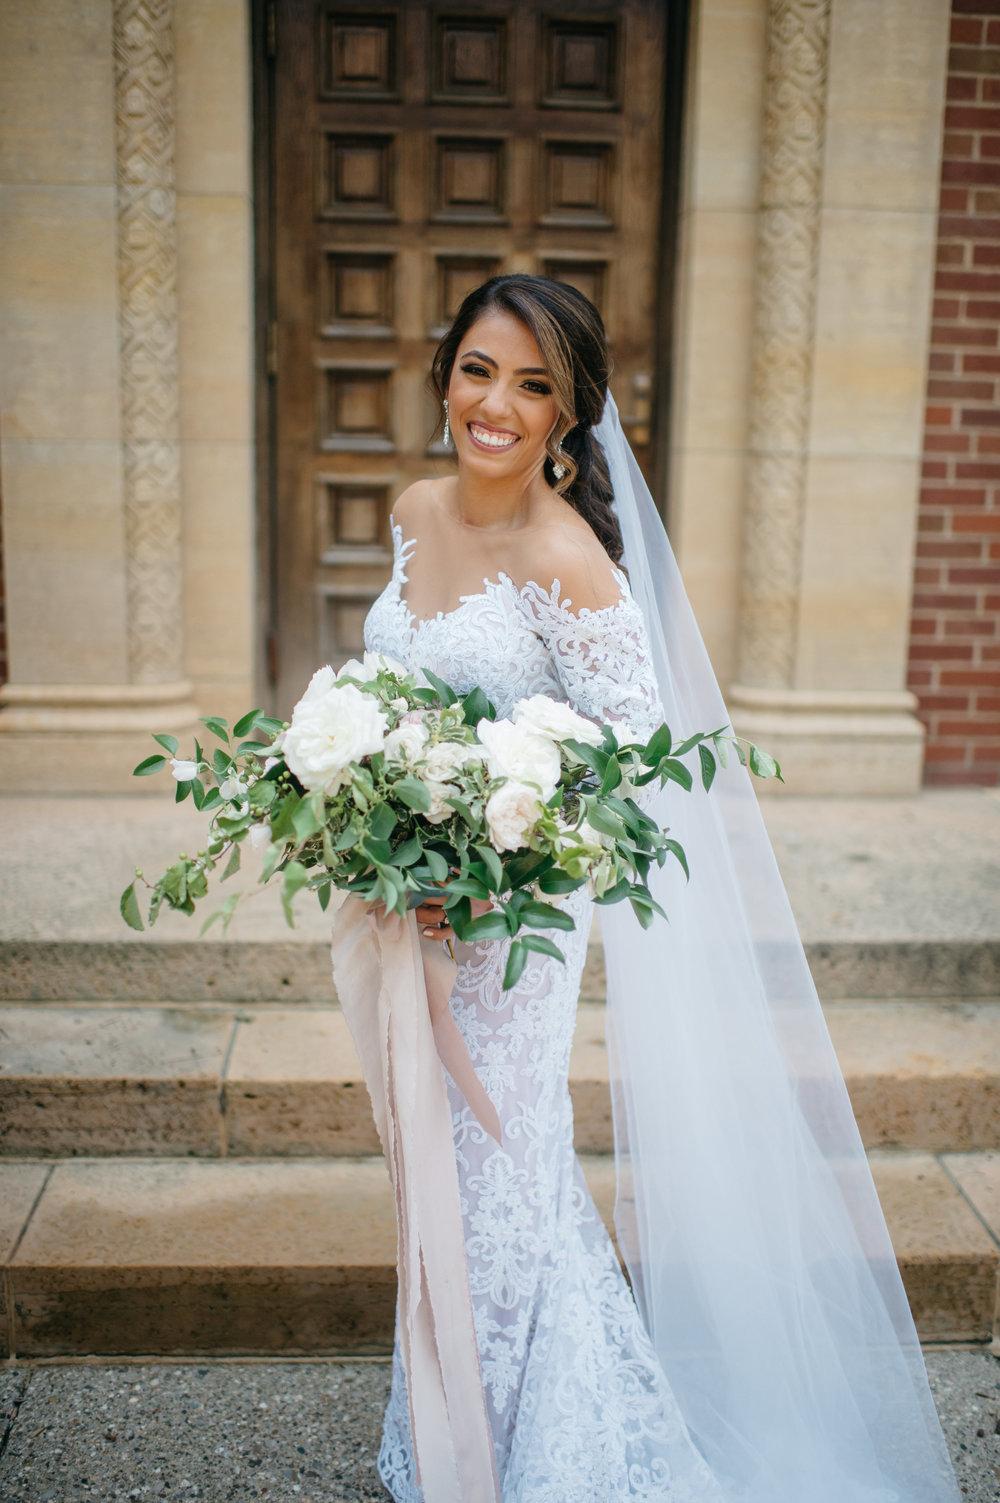 custom wedding planners michigan event design paper goods florals bouquet